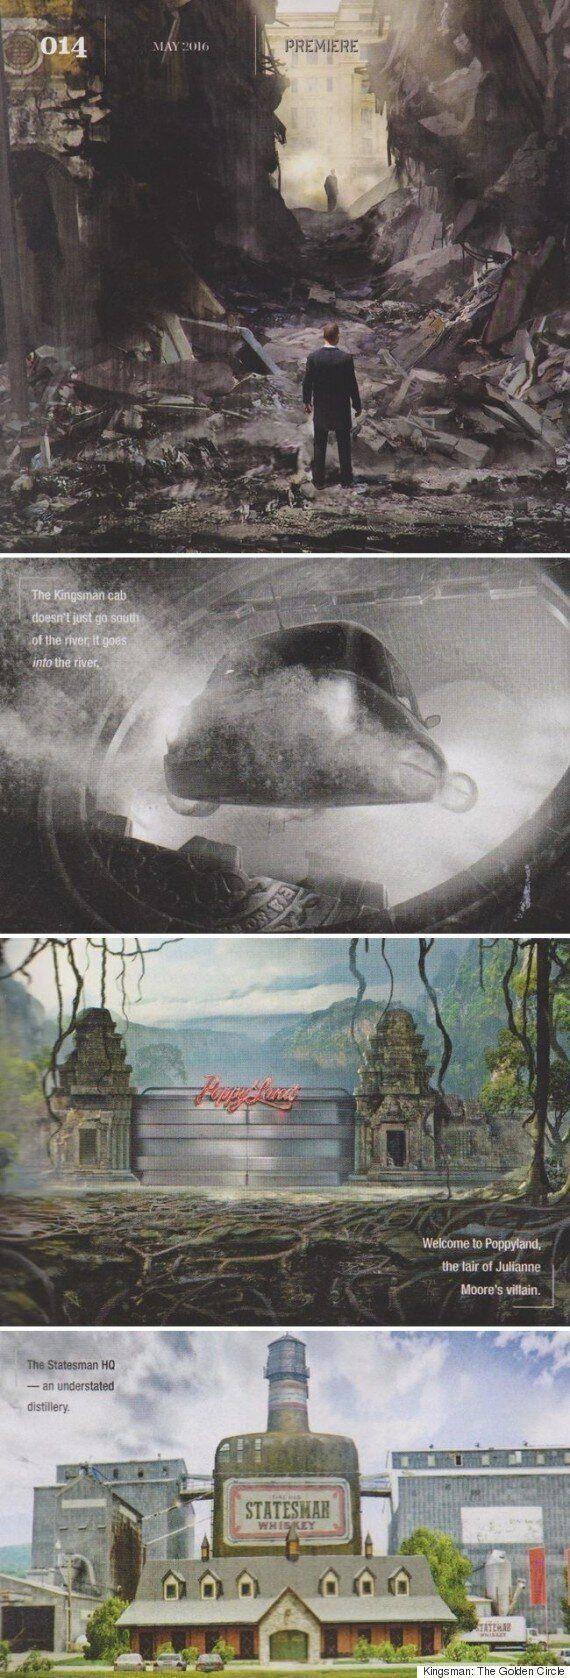 [Oh!llywood] '킹스맨2' 타이틀은 '킹스맨:골든 서클'..컨셉아트